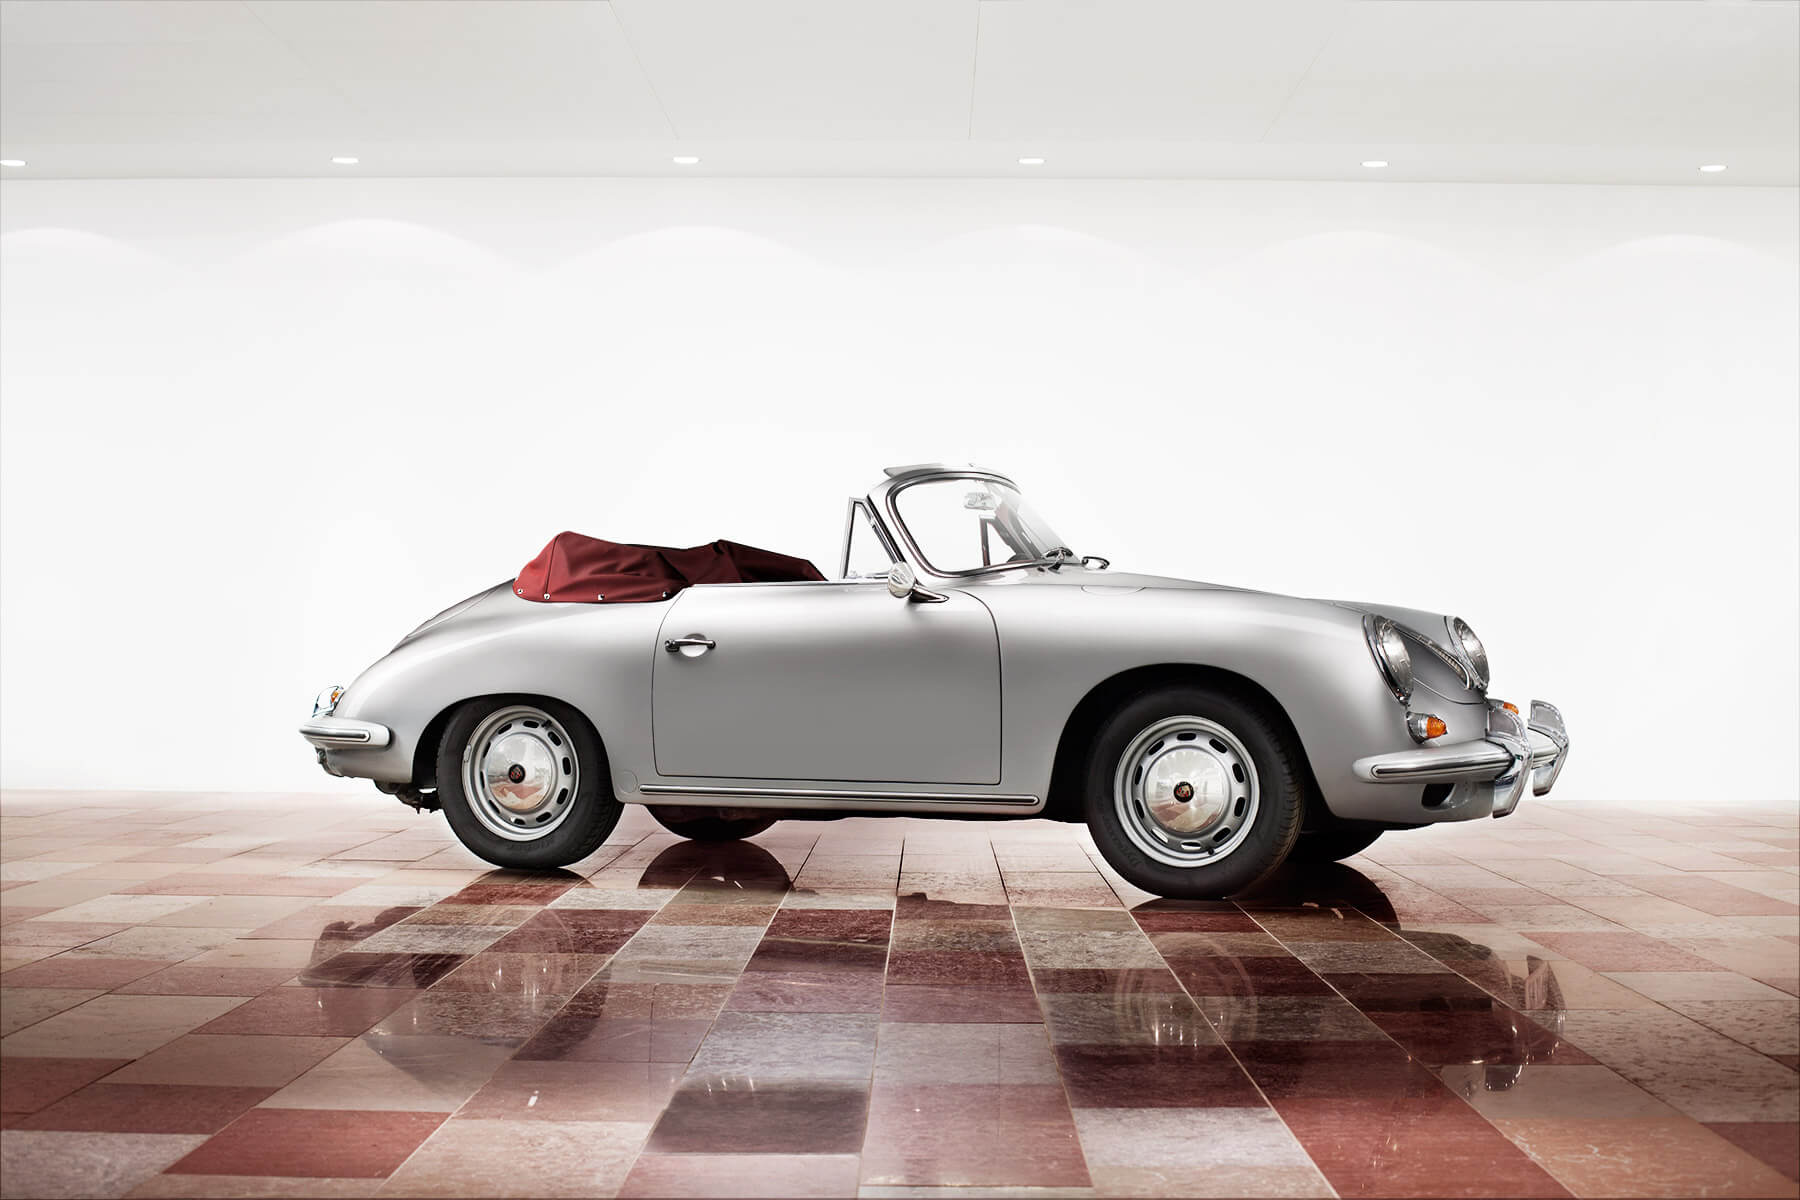 Silver Porsche 356C cabriolet